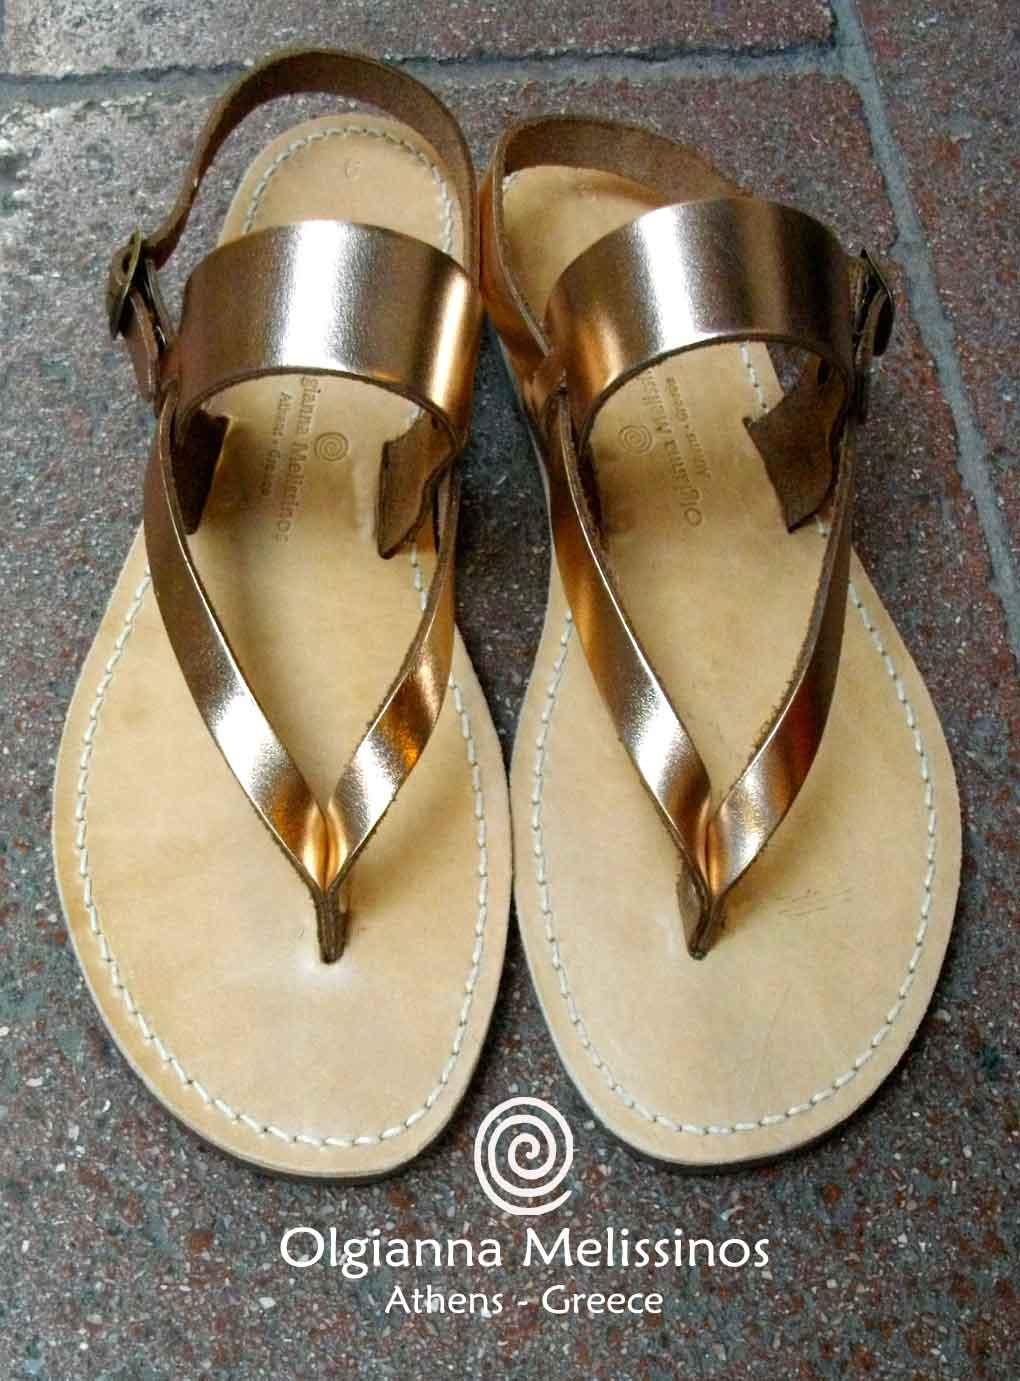 Handmade Sandals - THETA BRONZE 9BR